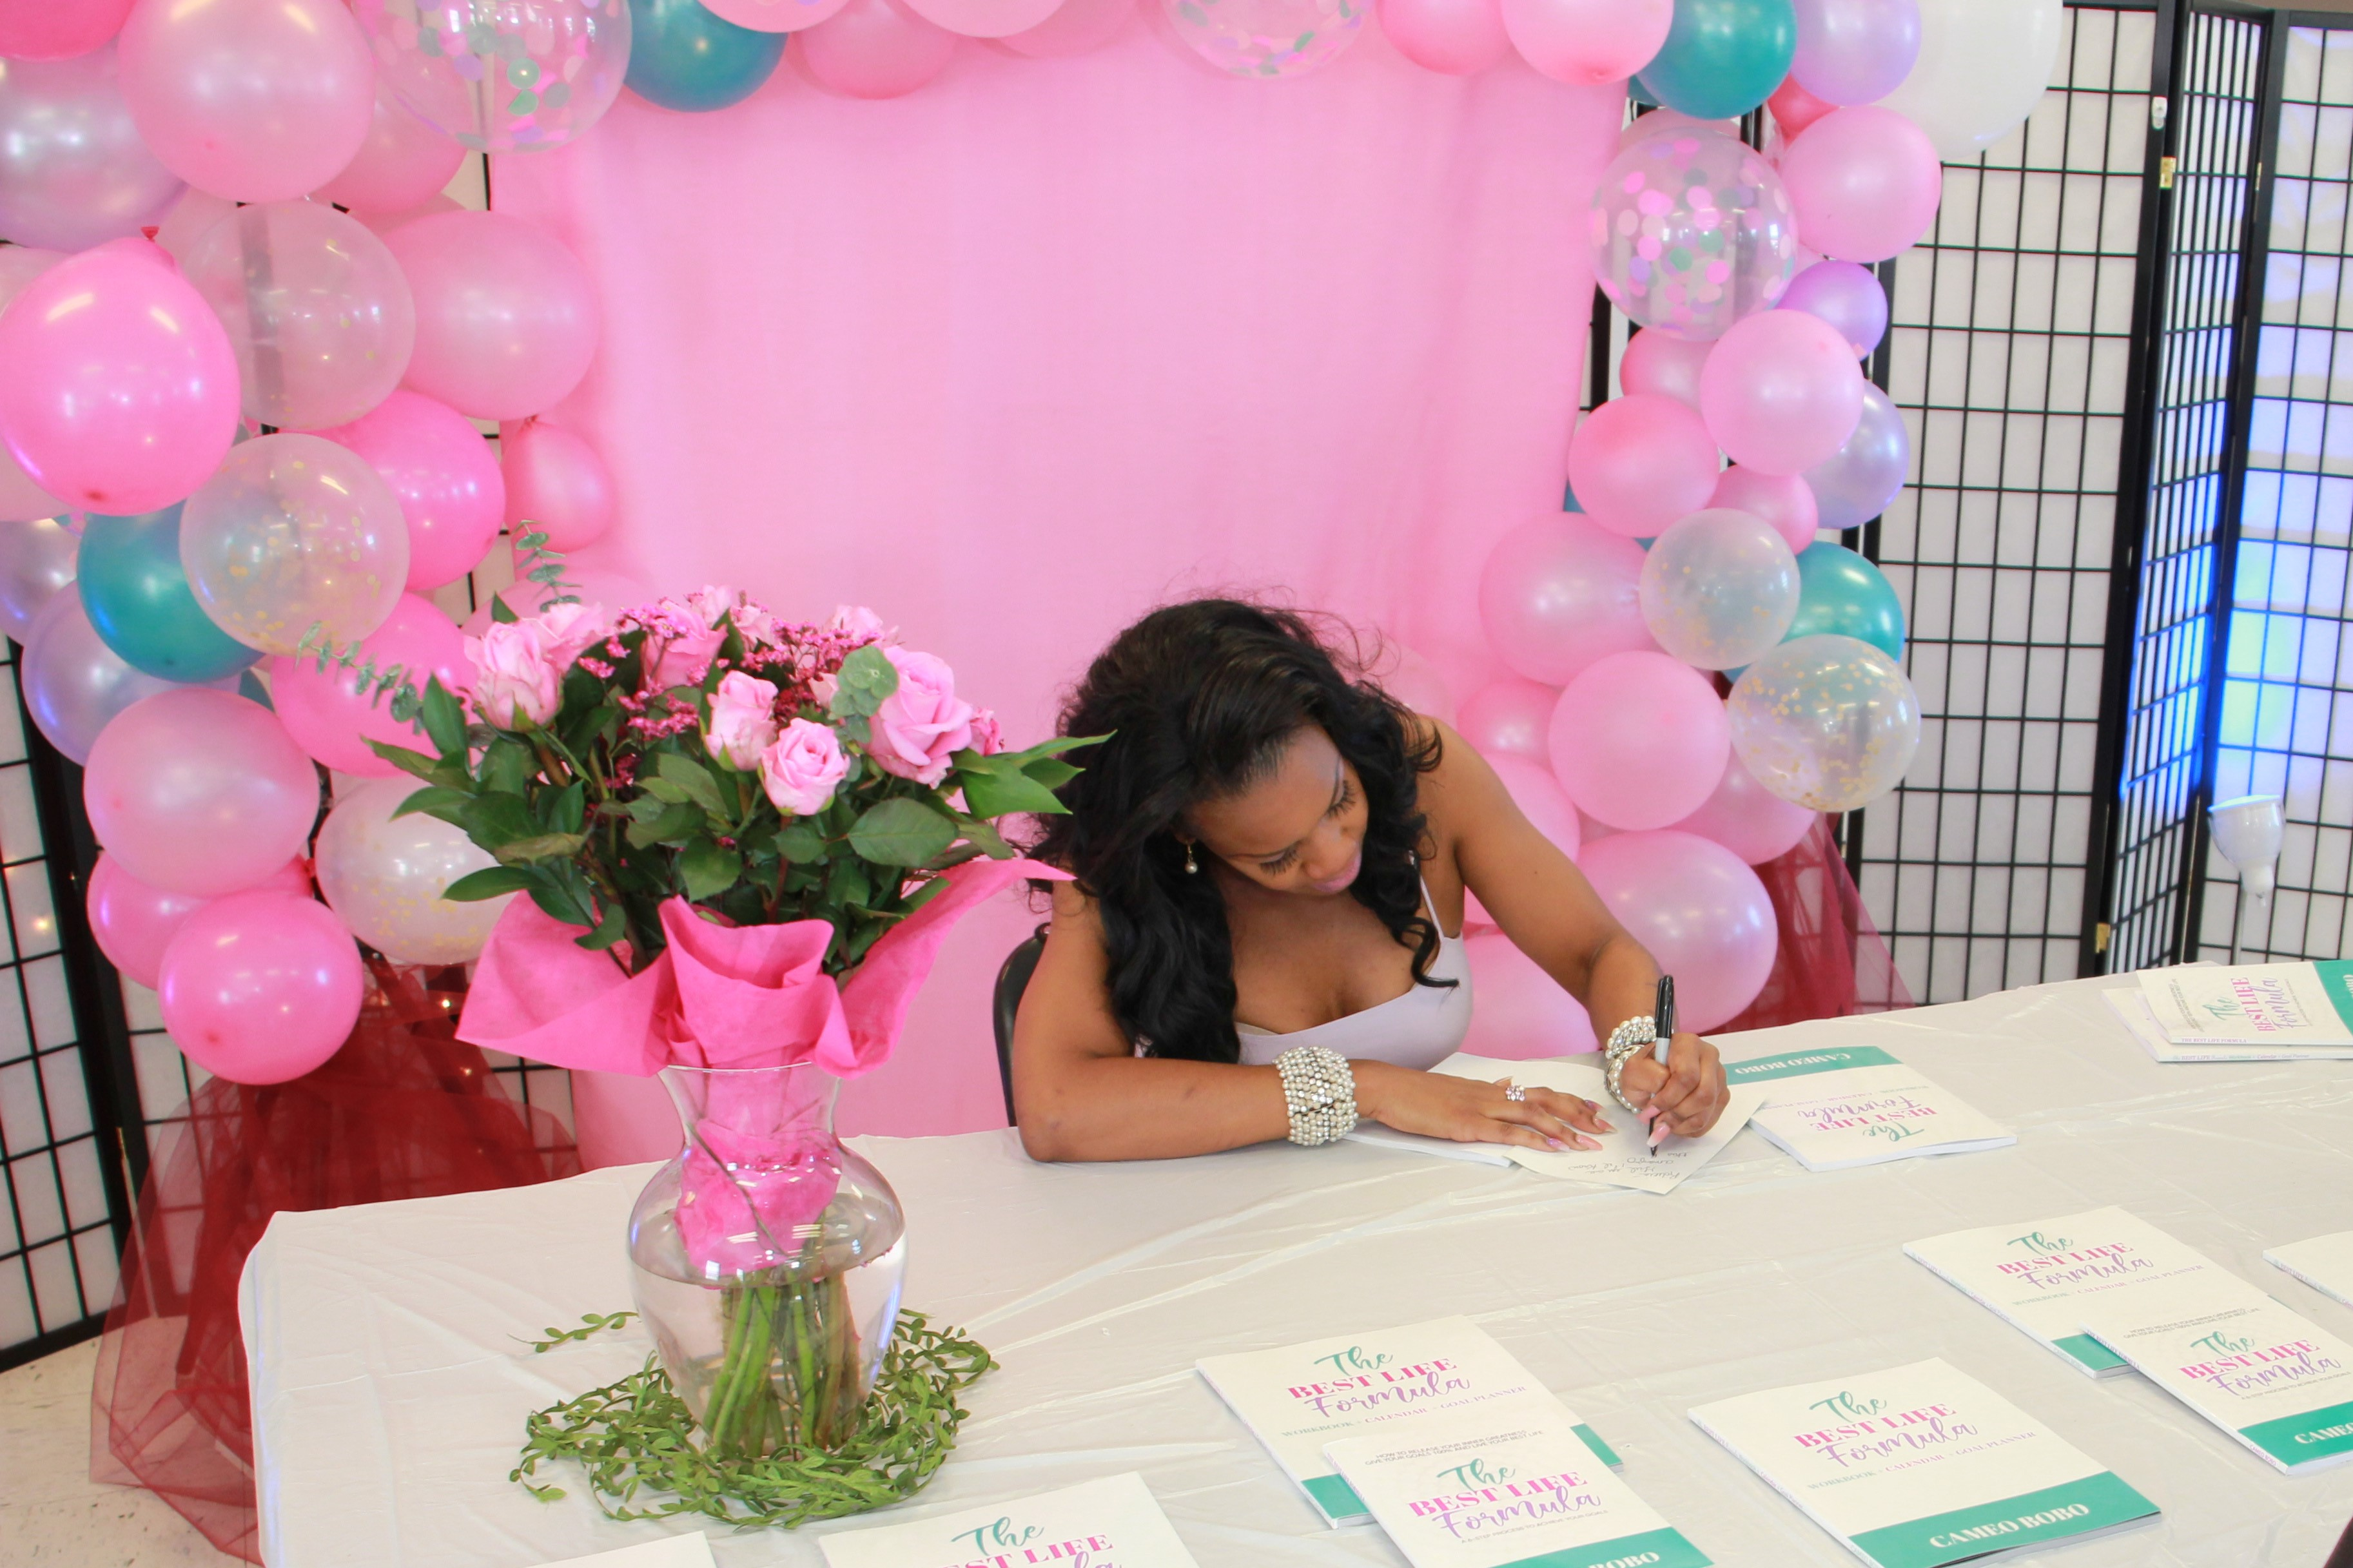 Cameo signing a book